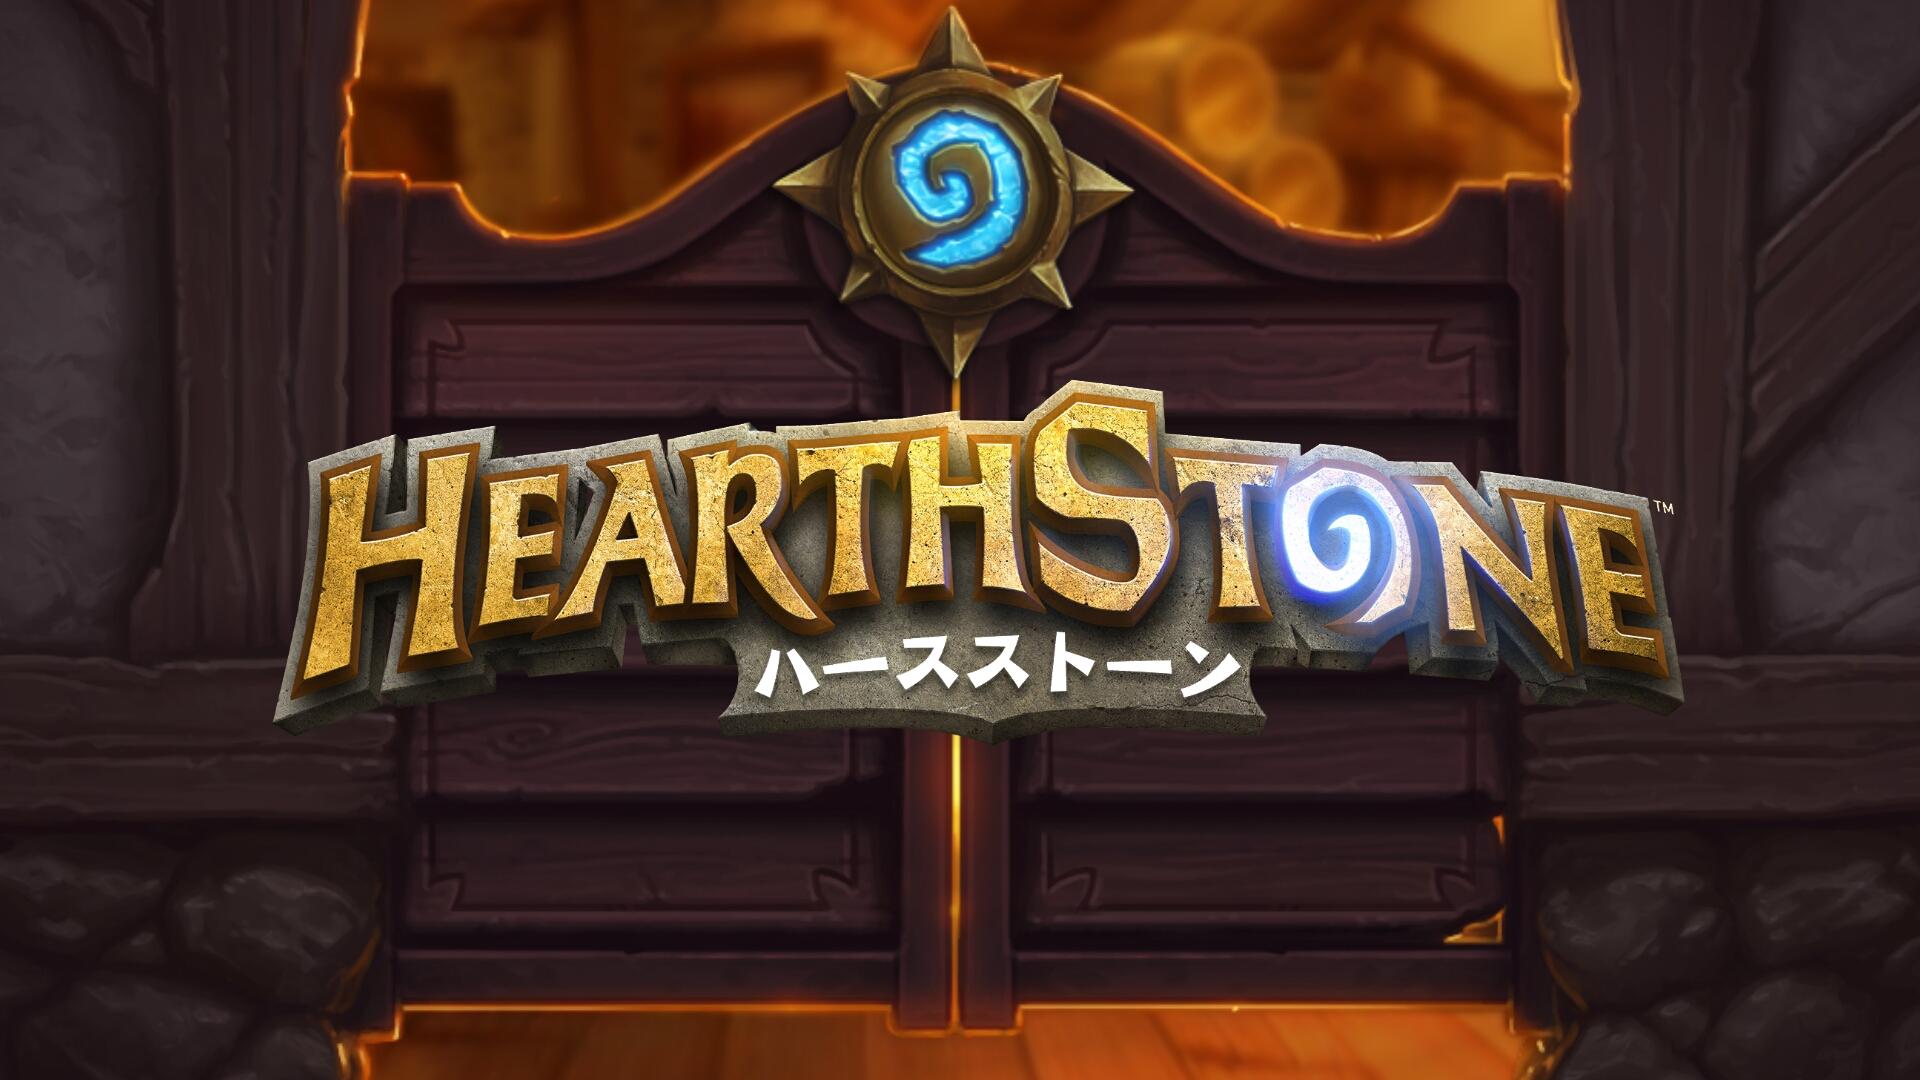 Hearthstone: ハースストーン タイトル画像